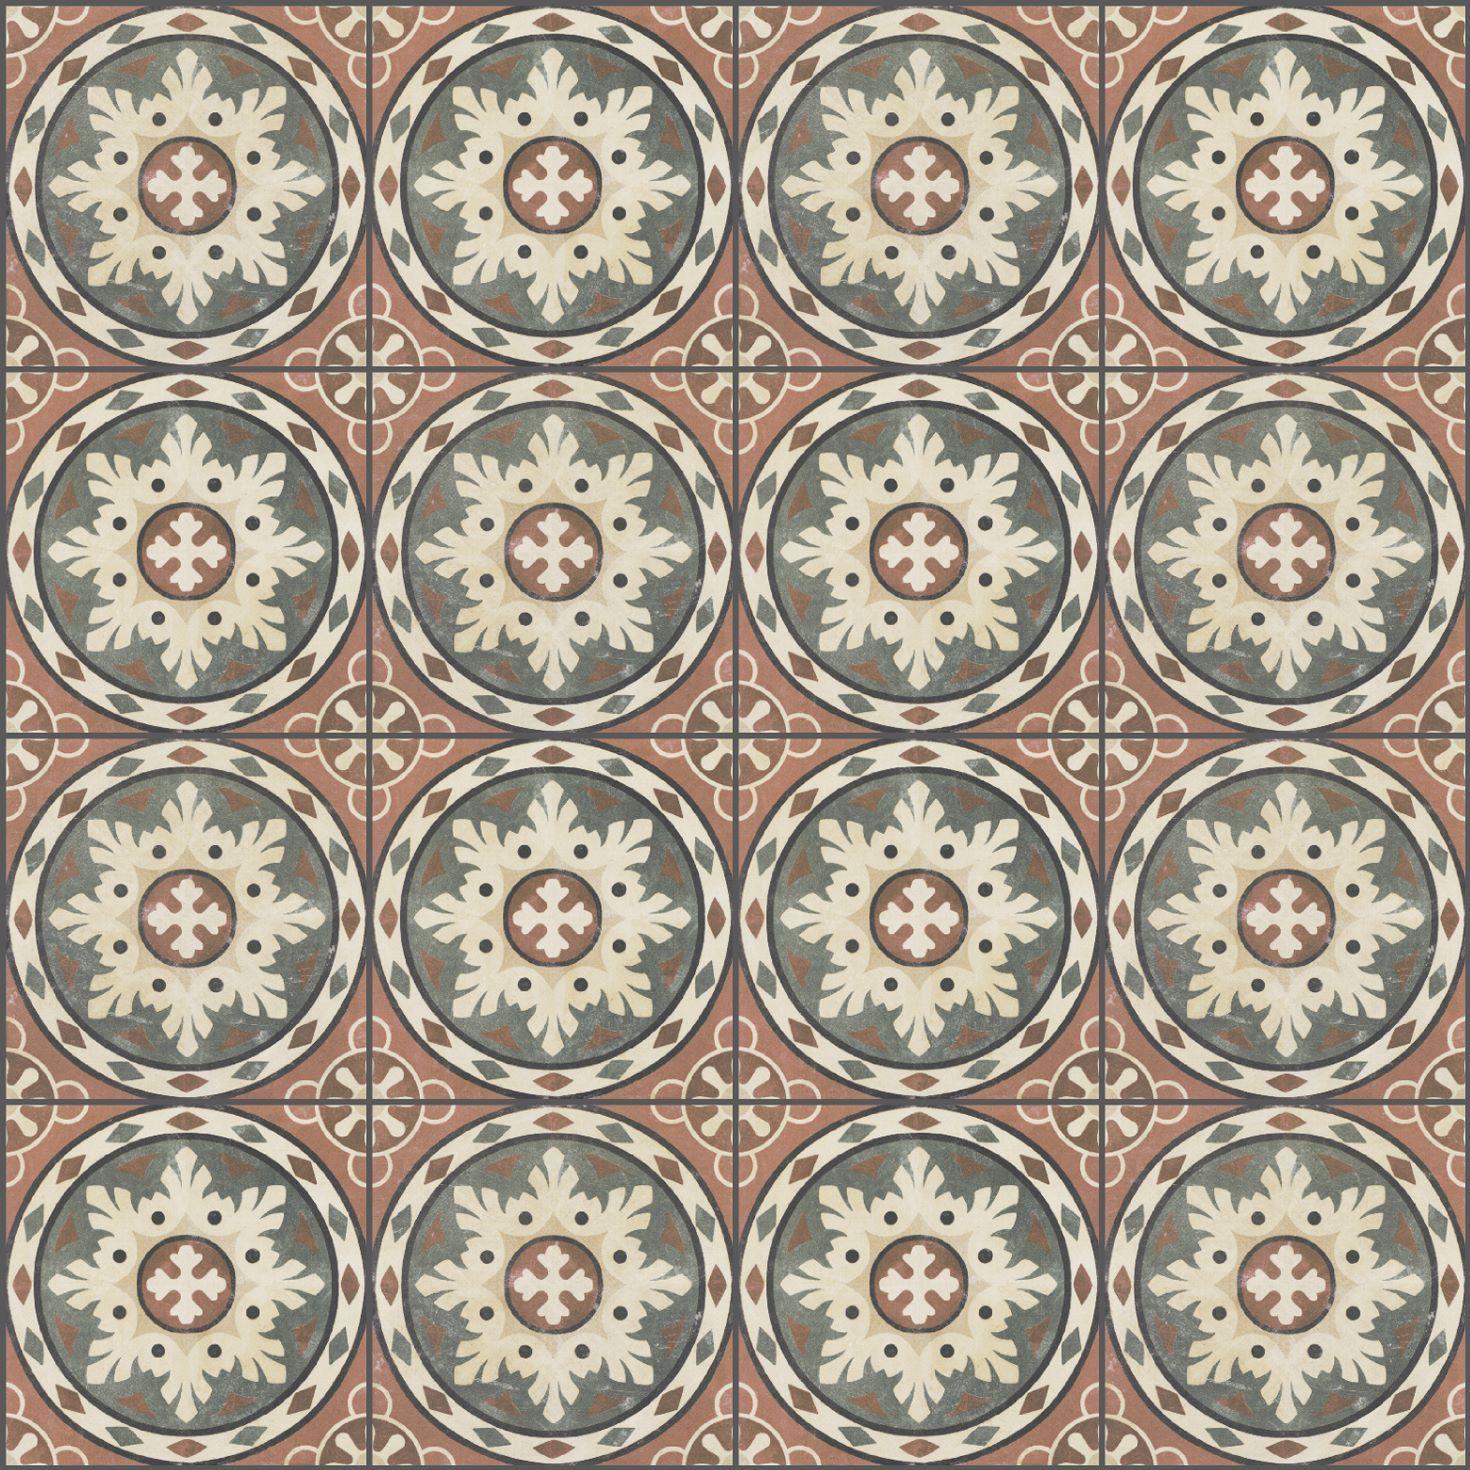 Vintage Ceramic Habana Rosso 25x25